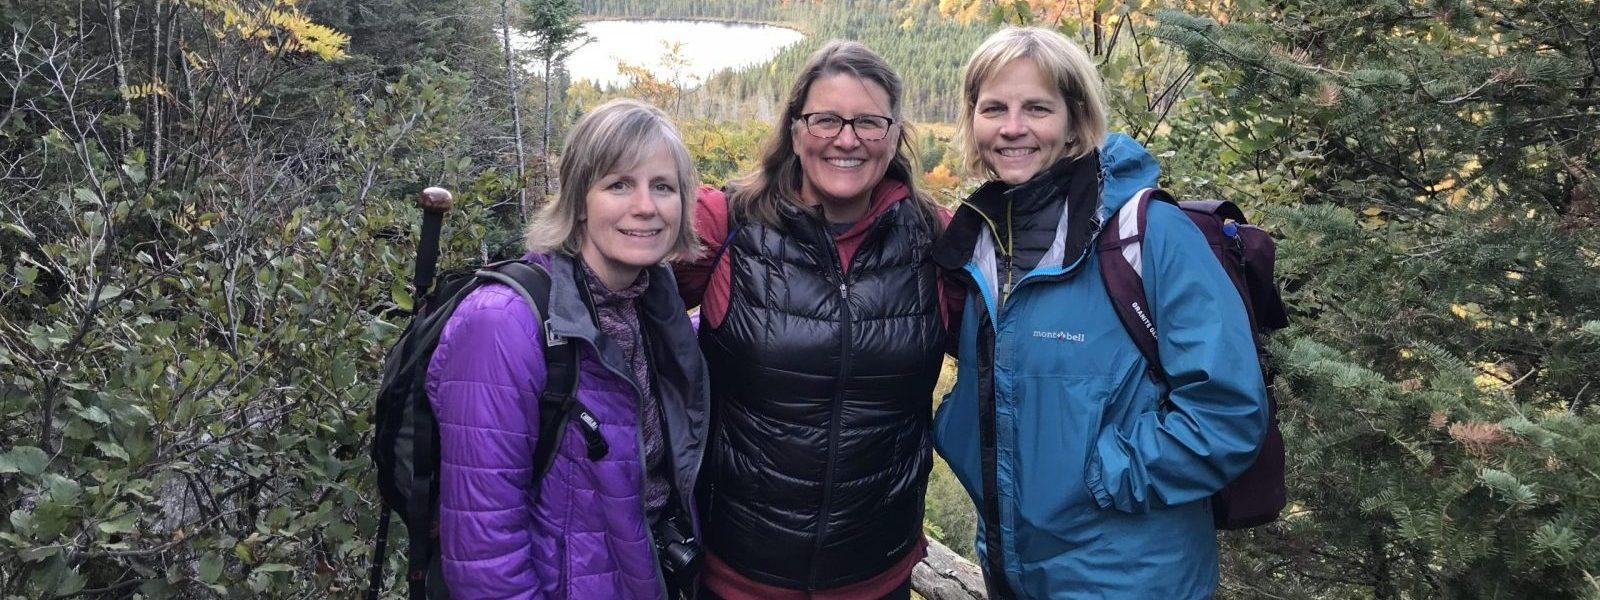 Superior Hiking Trail Year 2